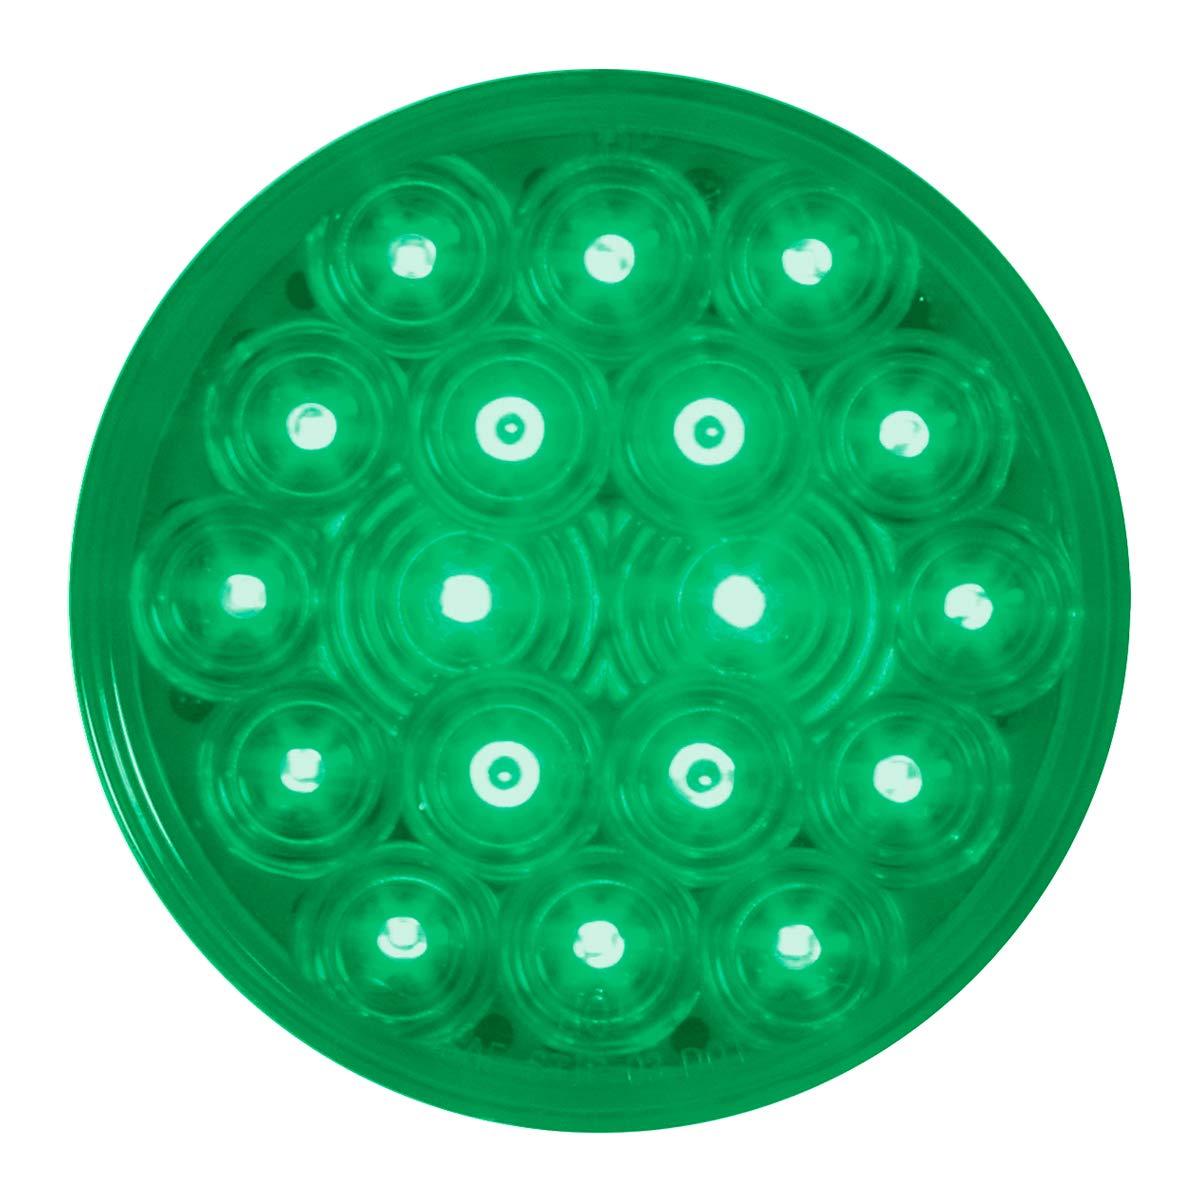 Interior 4 Fleet Green 18 LED Grand General 76898 Sealed Light